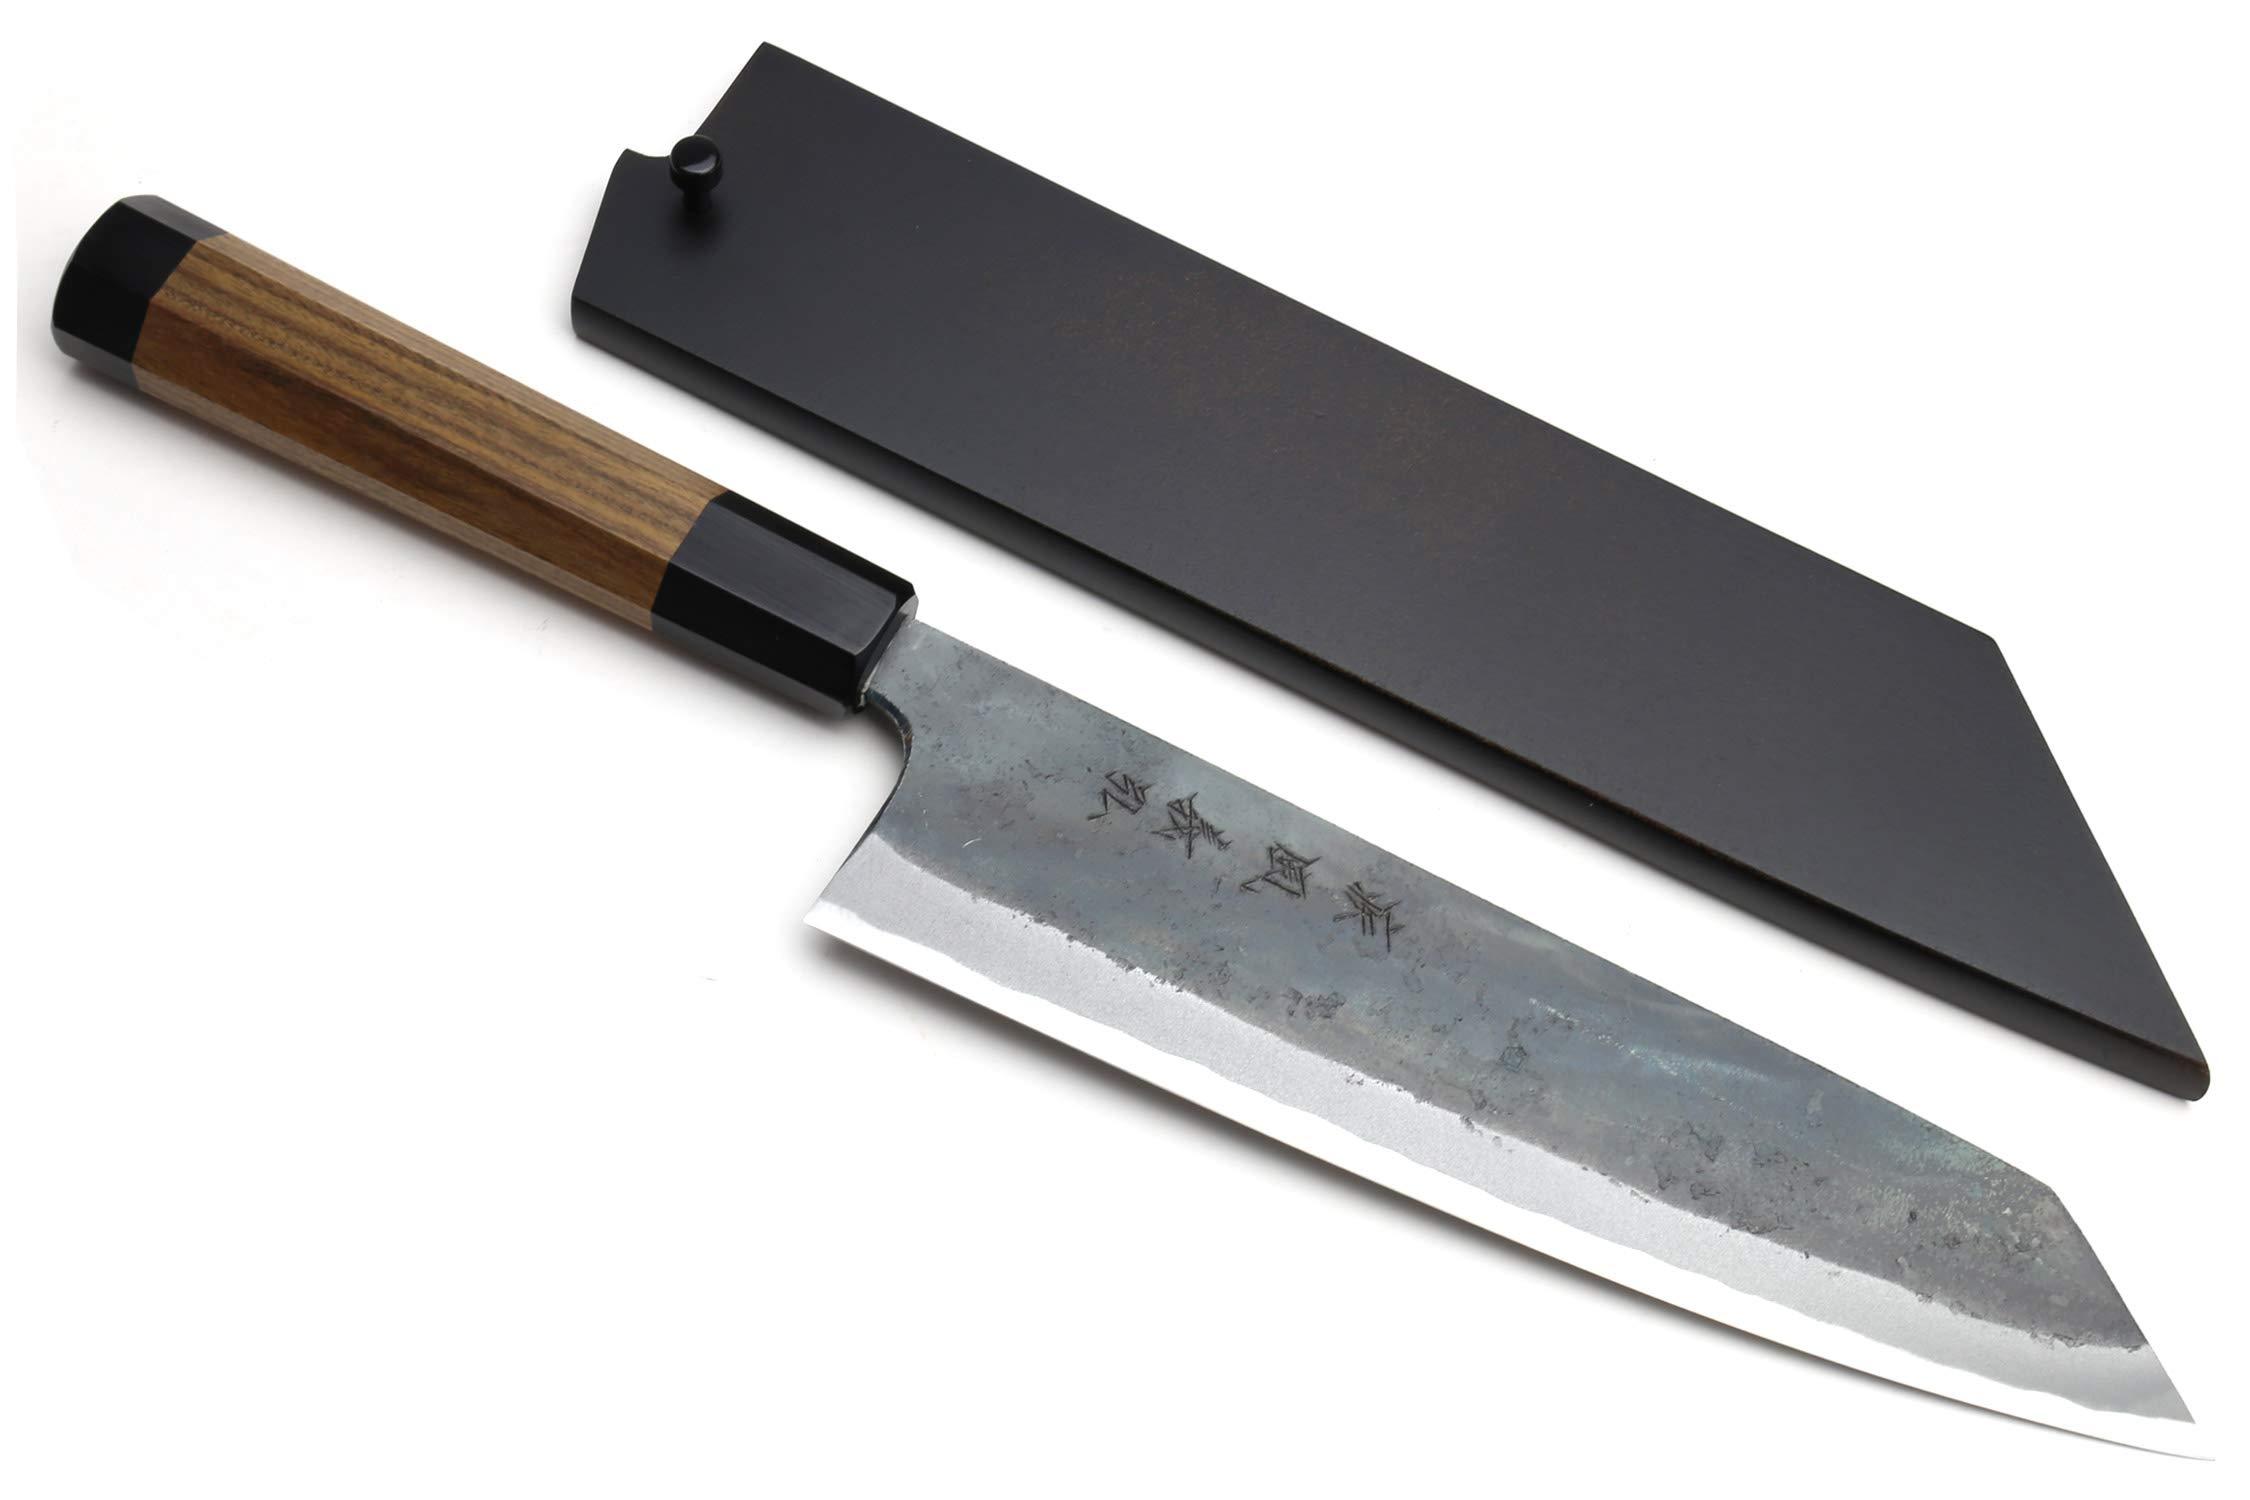 Yoshihiro Mizu Yaki Blue High Carbon Steel #1 Black Forged Kiritsuke Japanese Multipurpose Knife Shitan Rosewood Handle (9.5 In) with Nuri Saya Cover